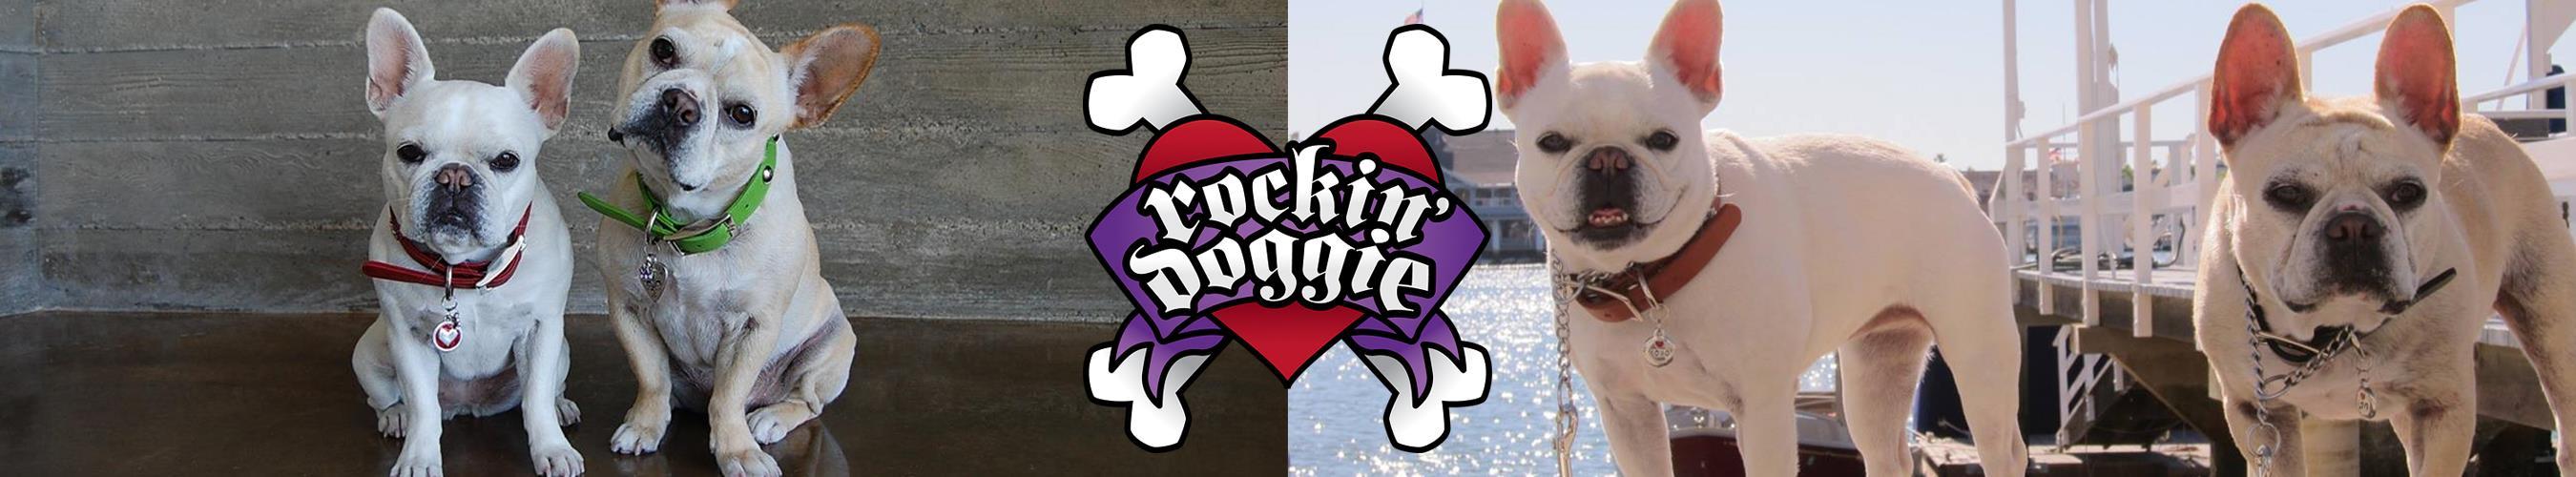 Rockin' Doggie